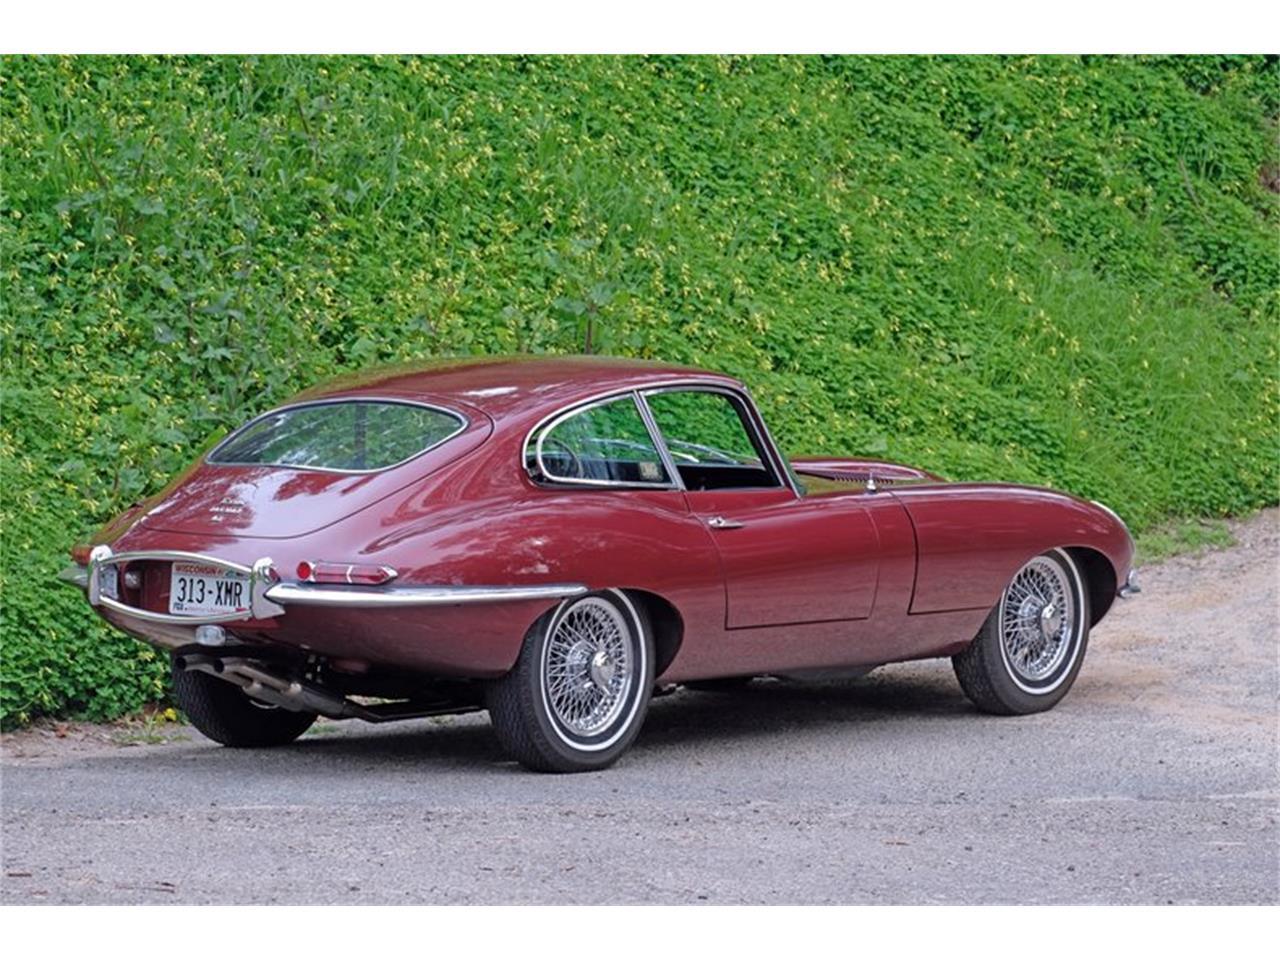 1967 Jaguar E-Type for Sale | ClassicCars.com | CC-1207645